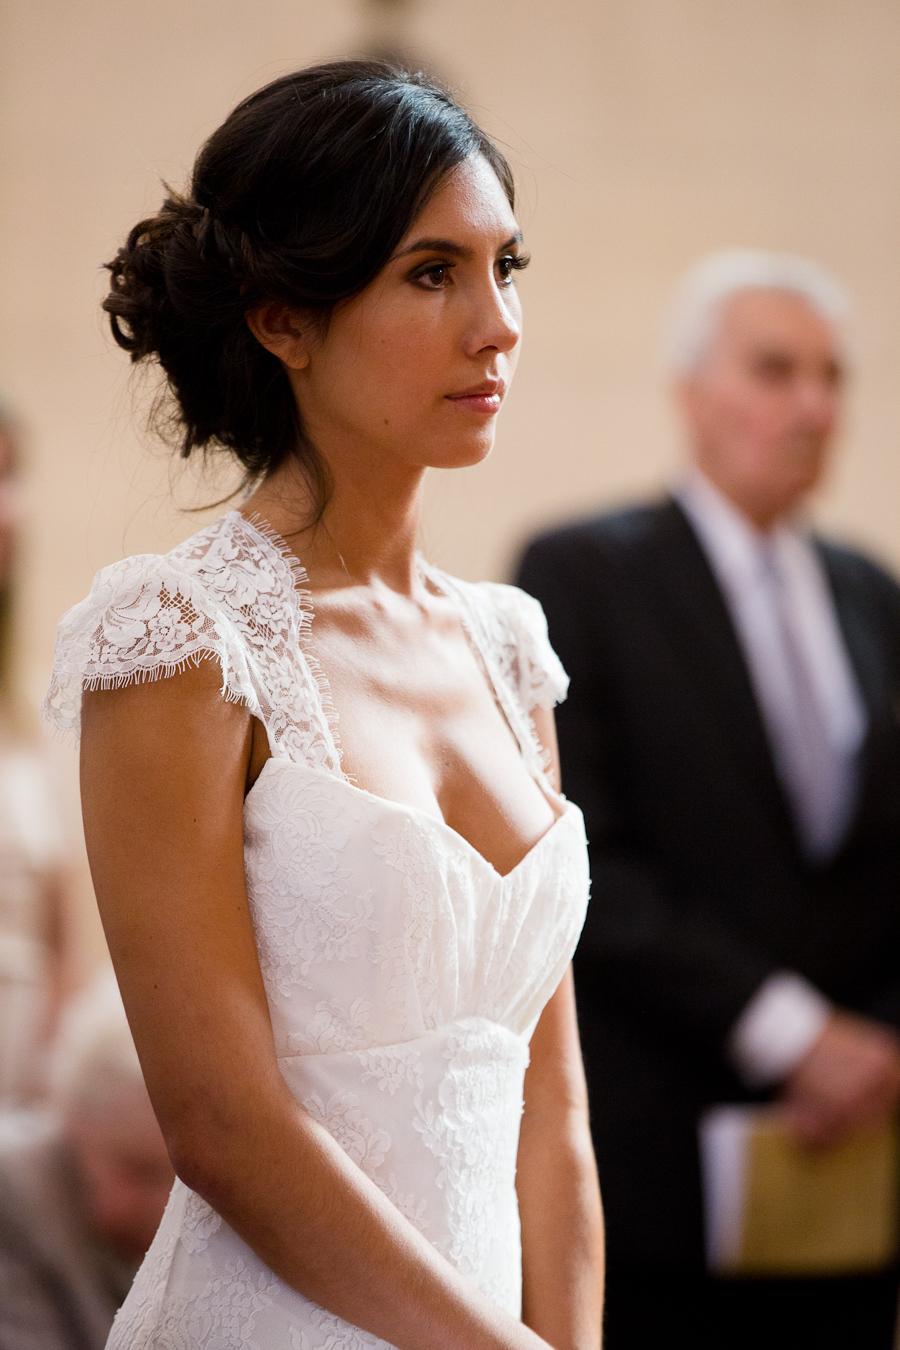 photographe-mariage-keith-flament-grange-de-montmartre-barbery-oise-68